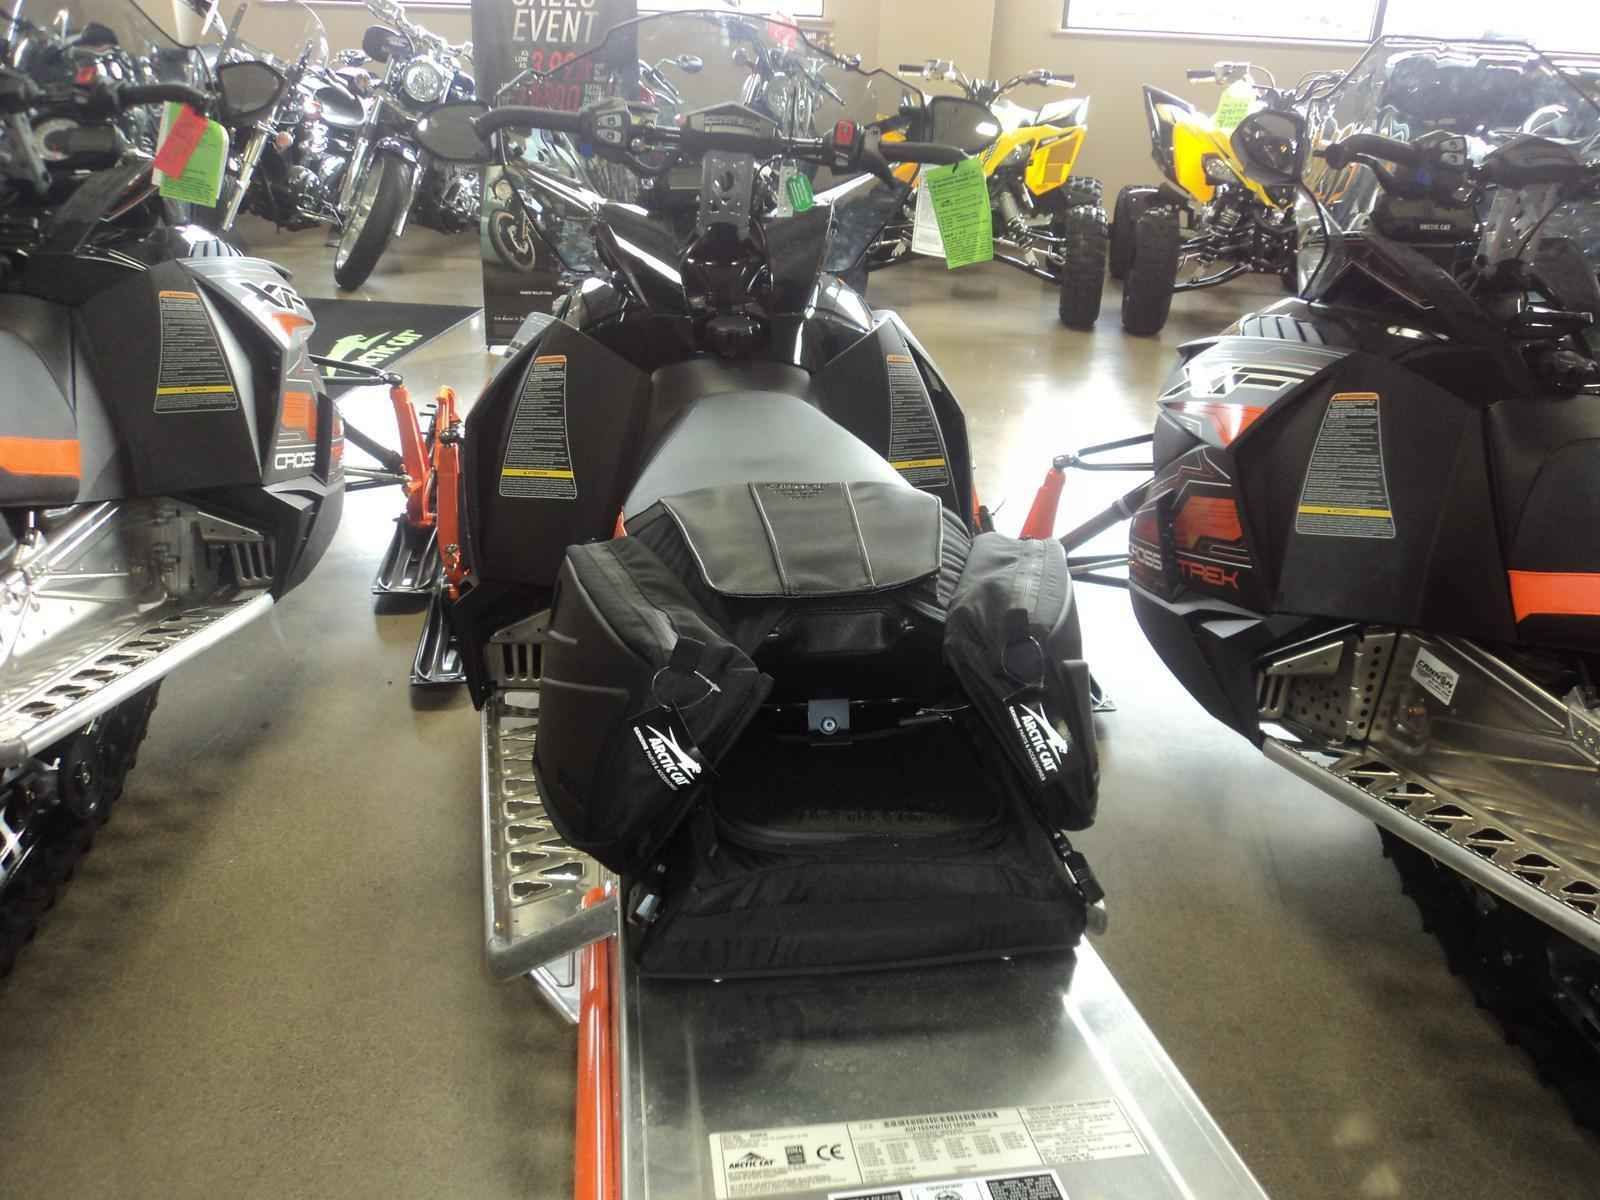 New 2016 Arctic Cat XF 7000 CrossTrek Snowmobile For Sale